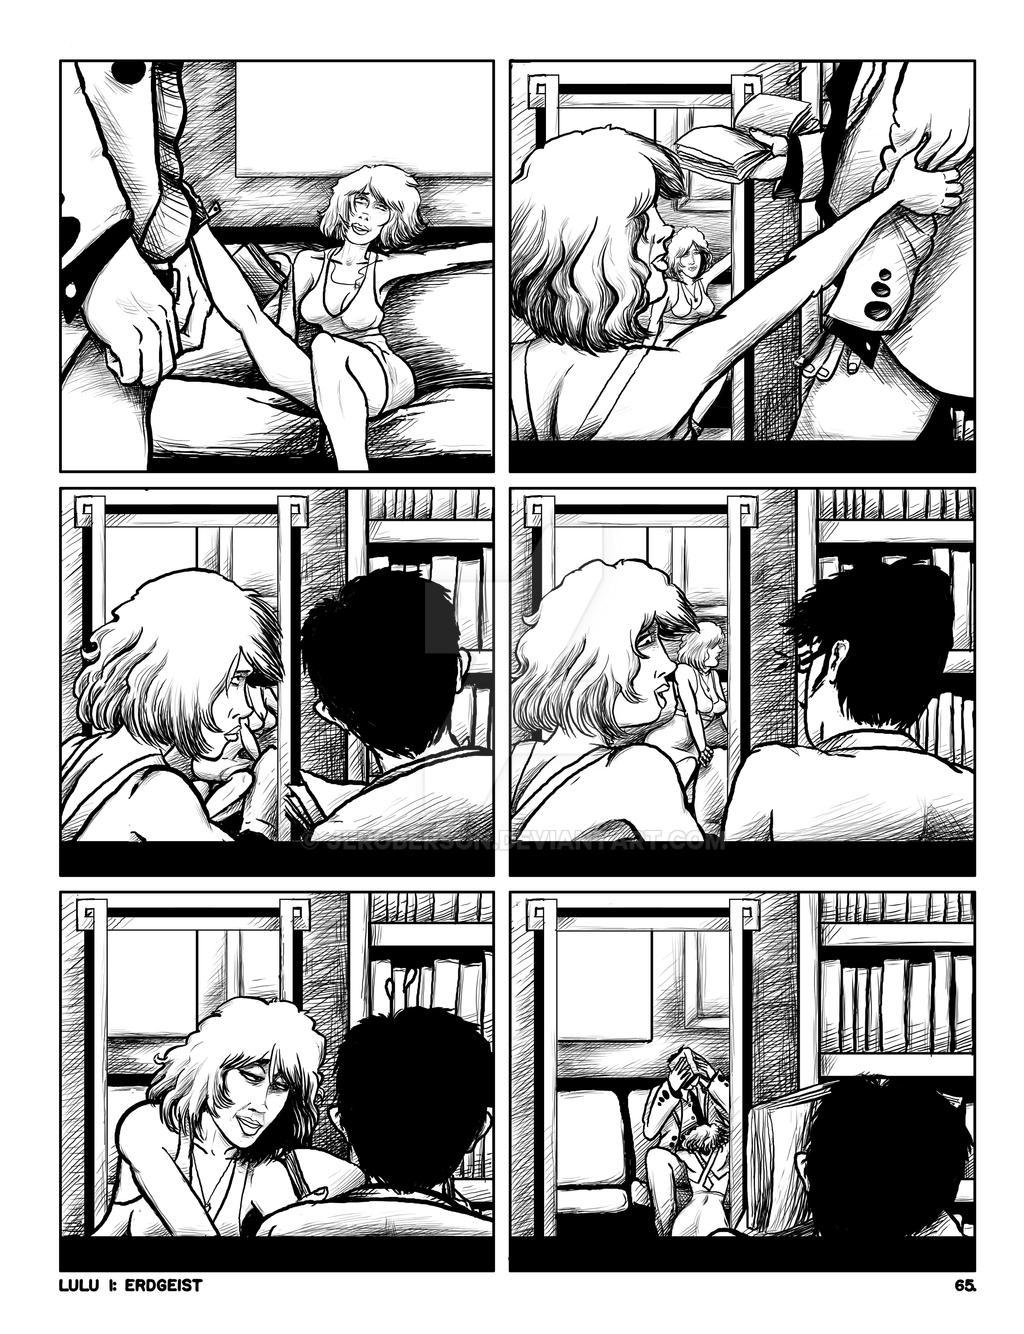 LULU Book 2 - Chapter 4 p. 65 Plain inks